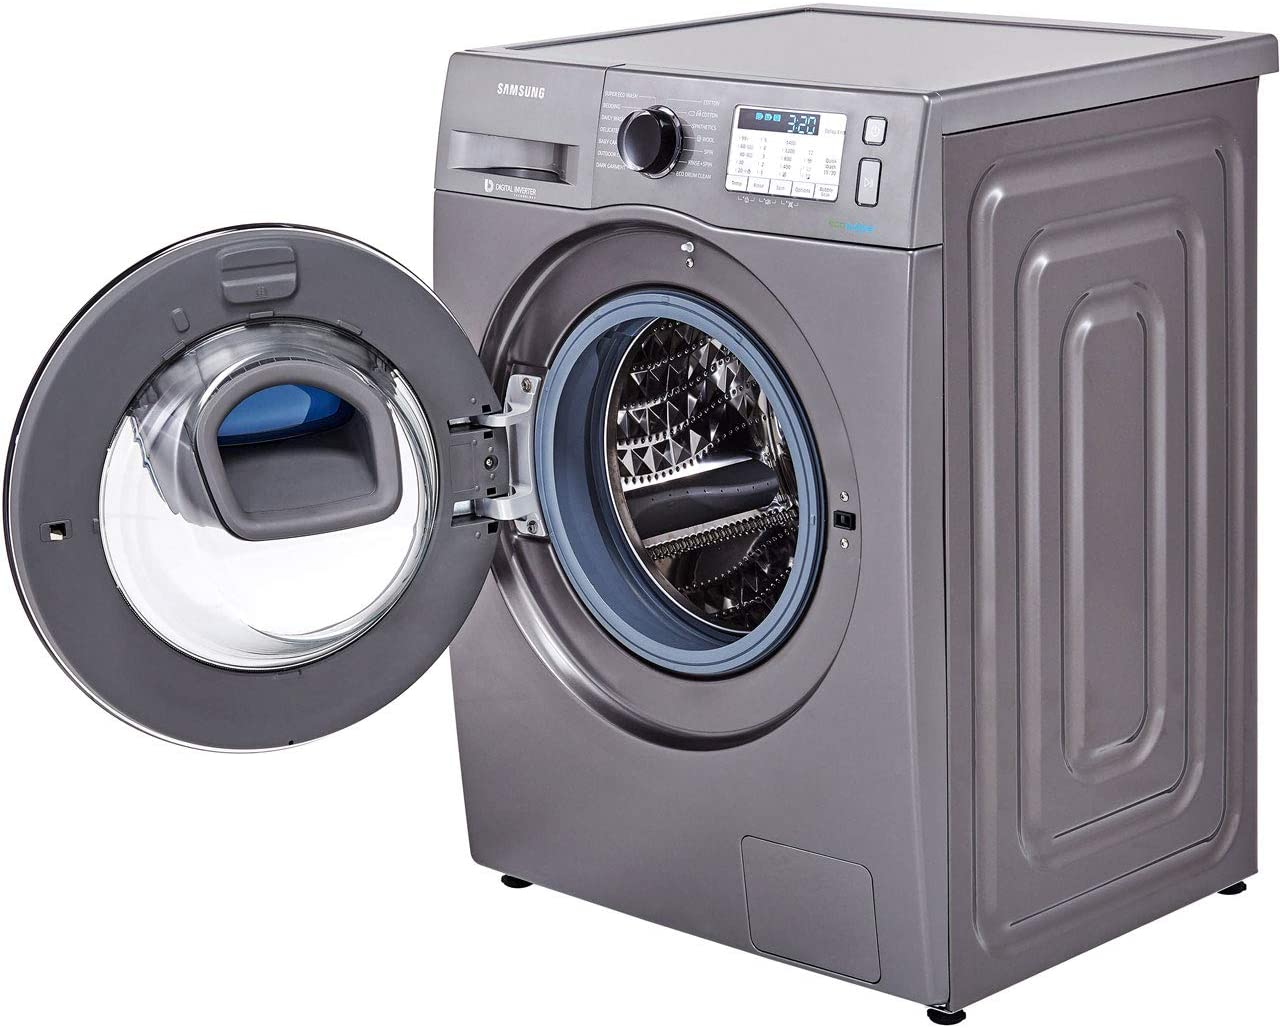 SAMSUNG Ww80k5413ux ecobubble 1400rpm addwash ™ Lavadora de Carga ...